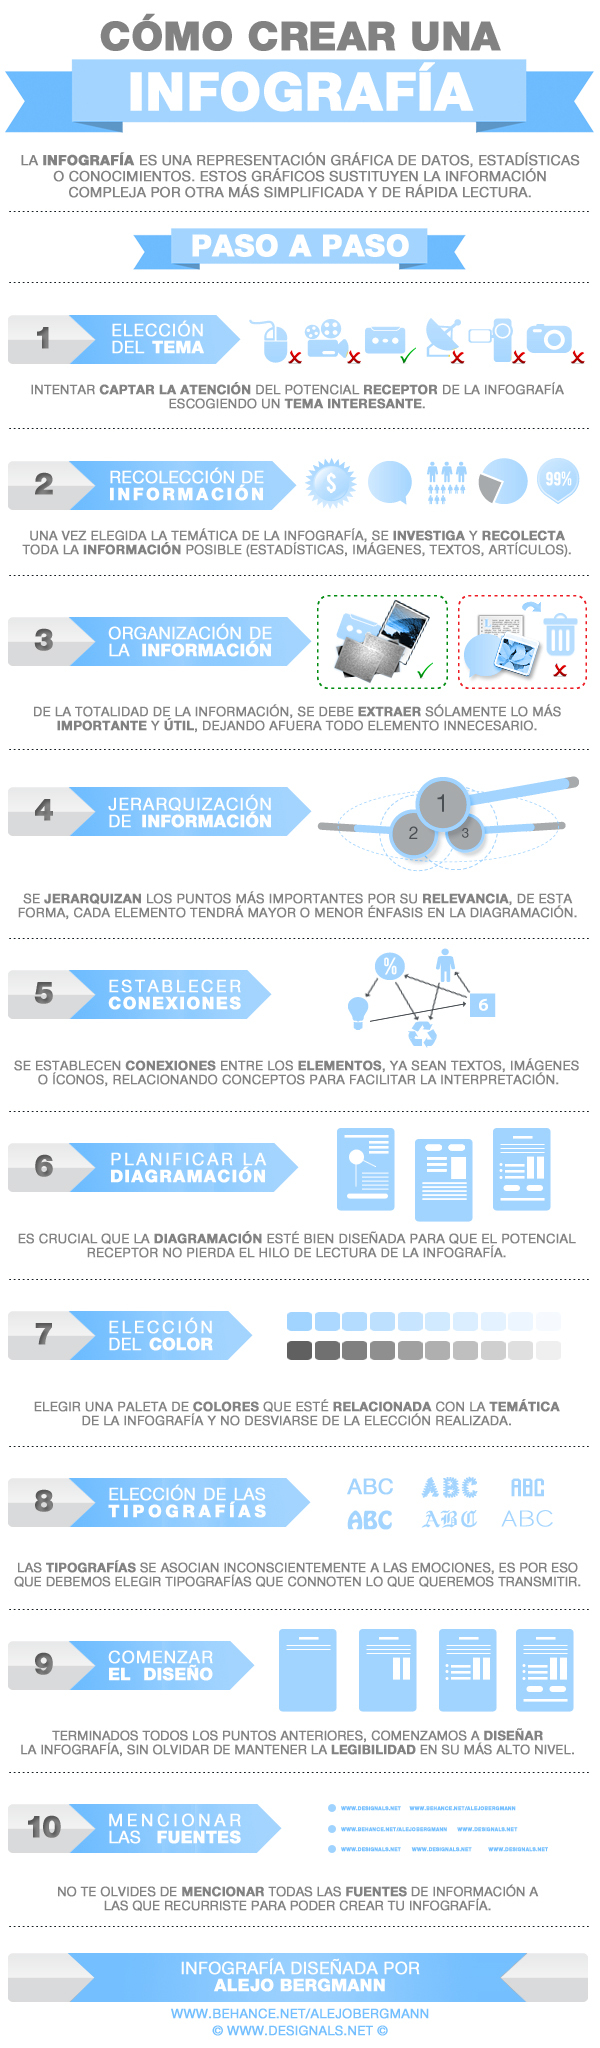 como-crear-una-infografia